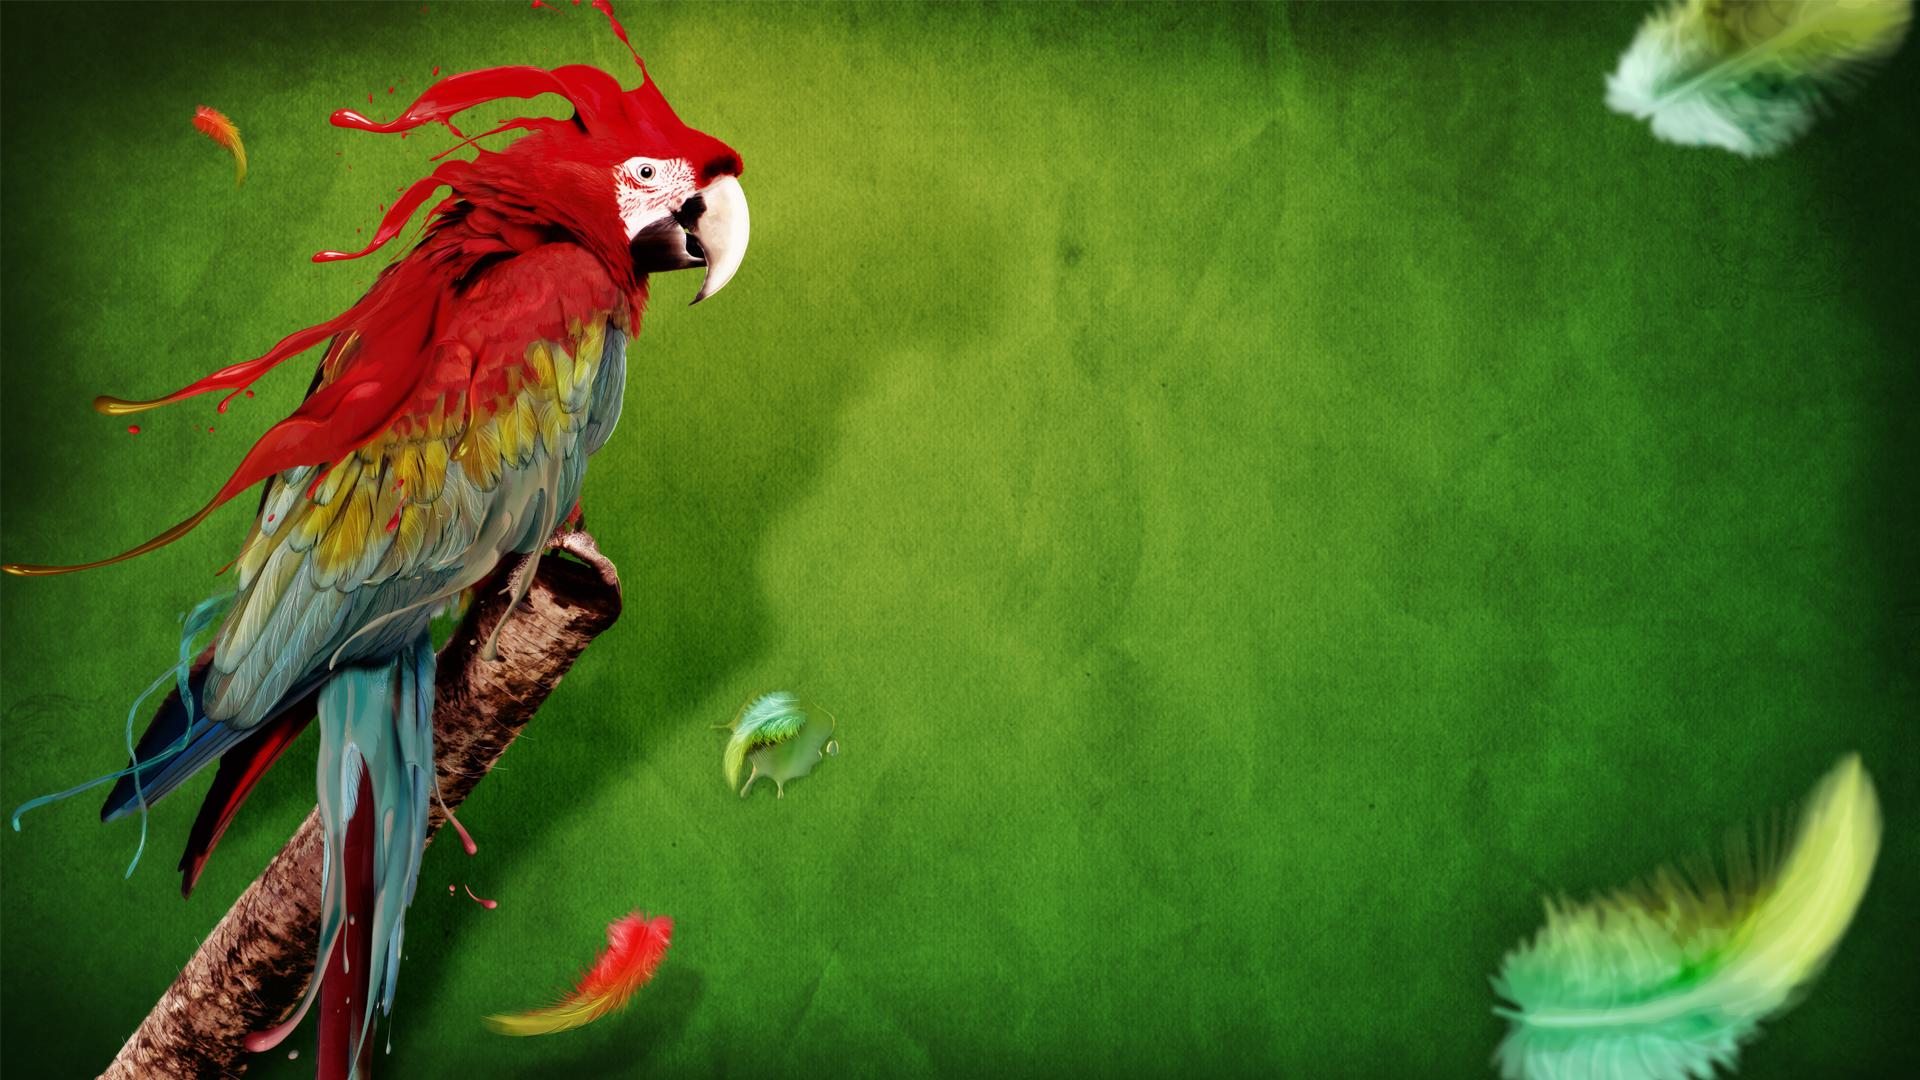 splash of color hd - photo #33